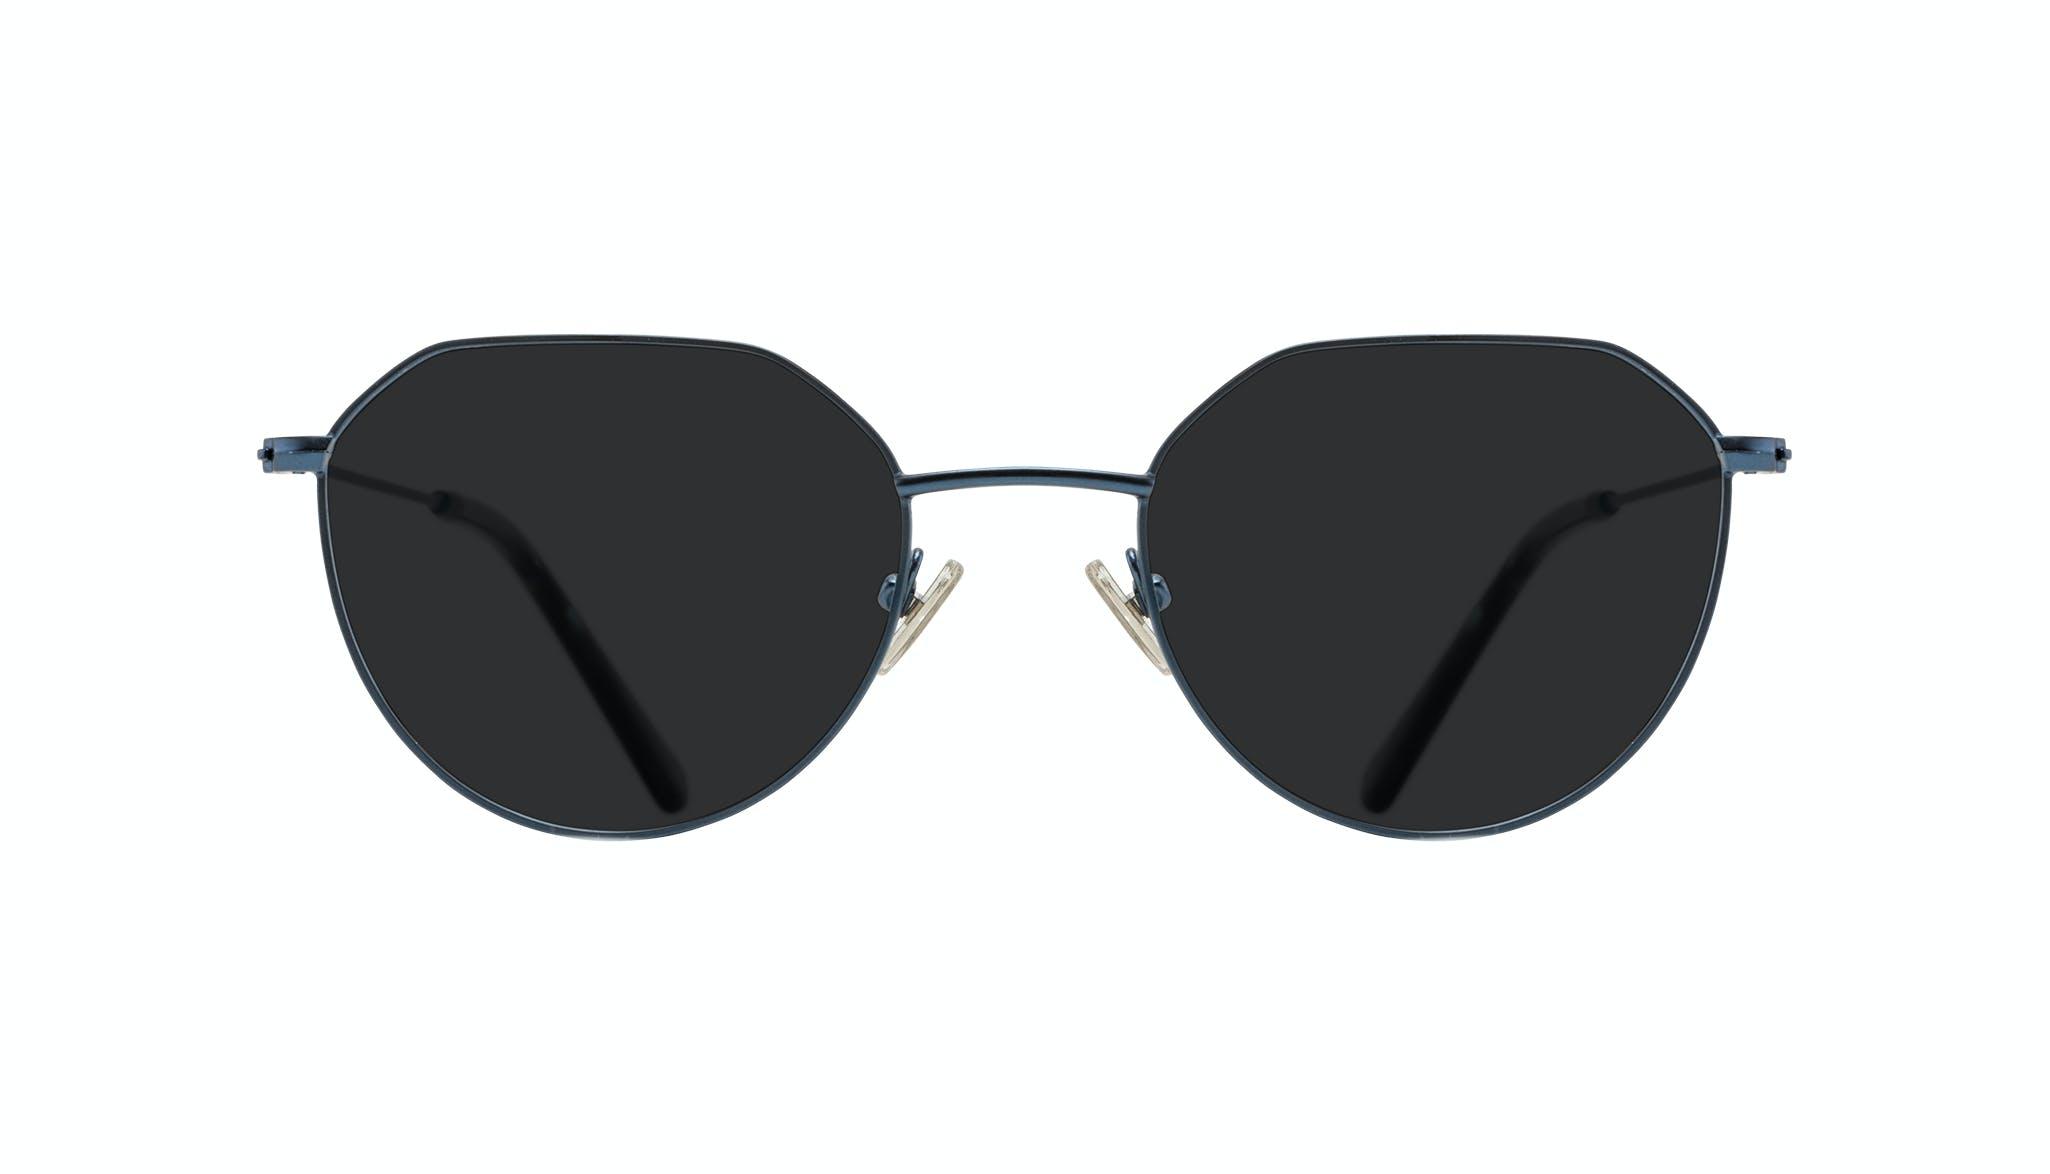 Affordable Fashion Glasses Round Sunglasses Women Prism Marine